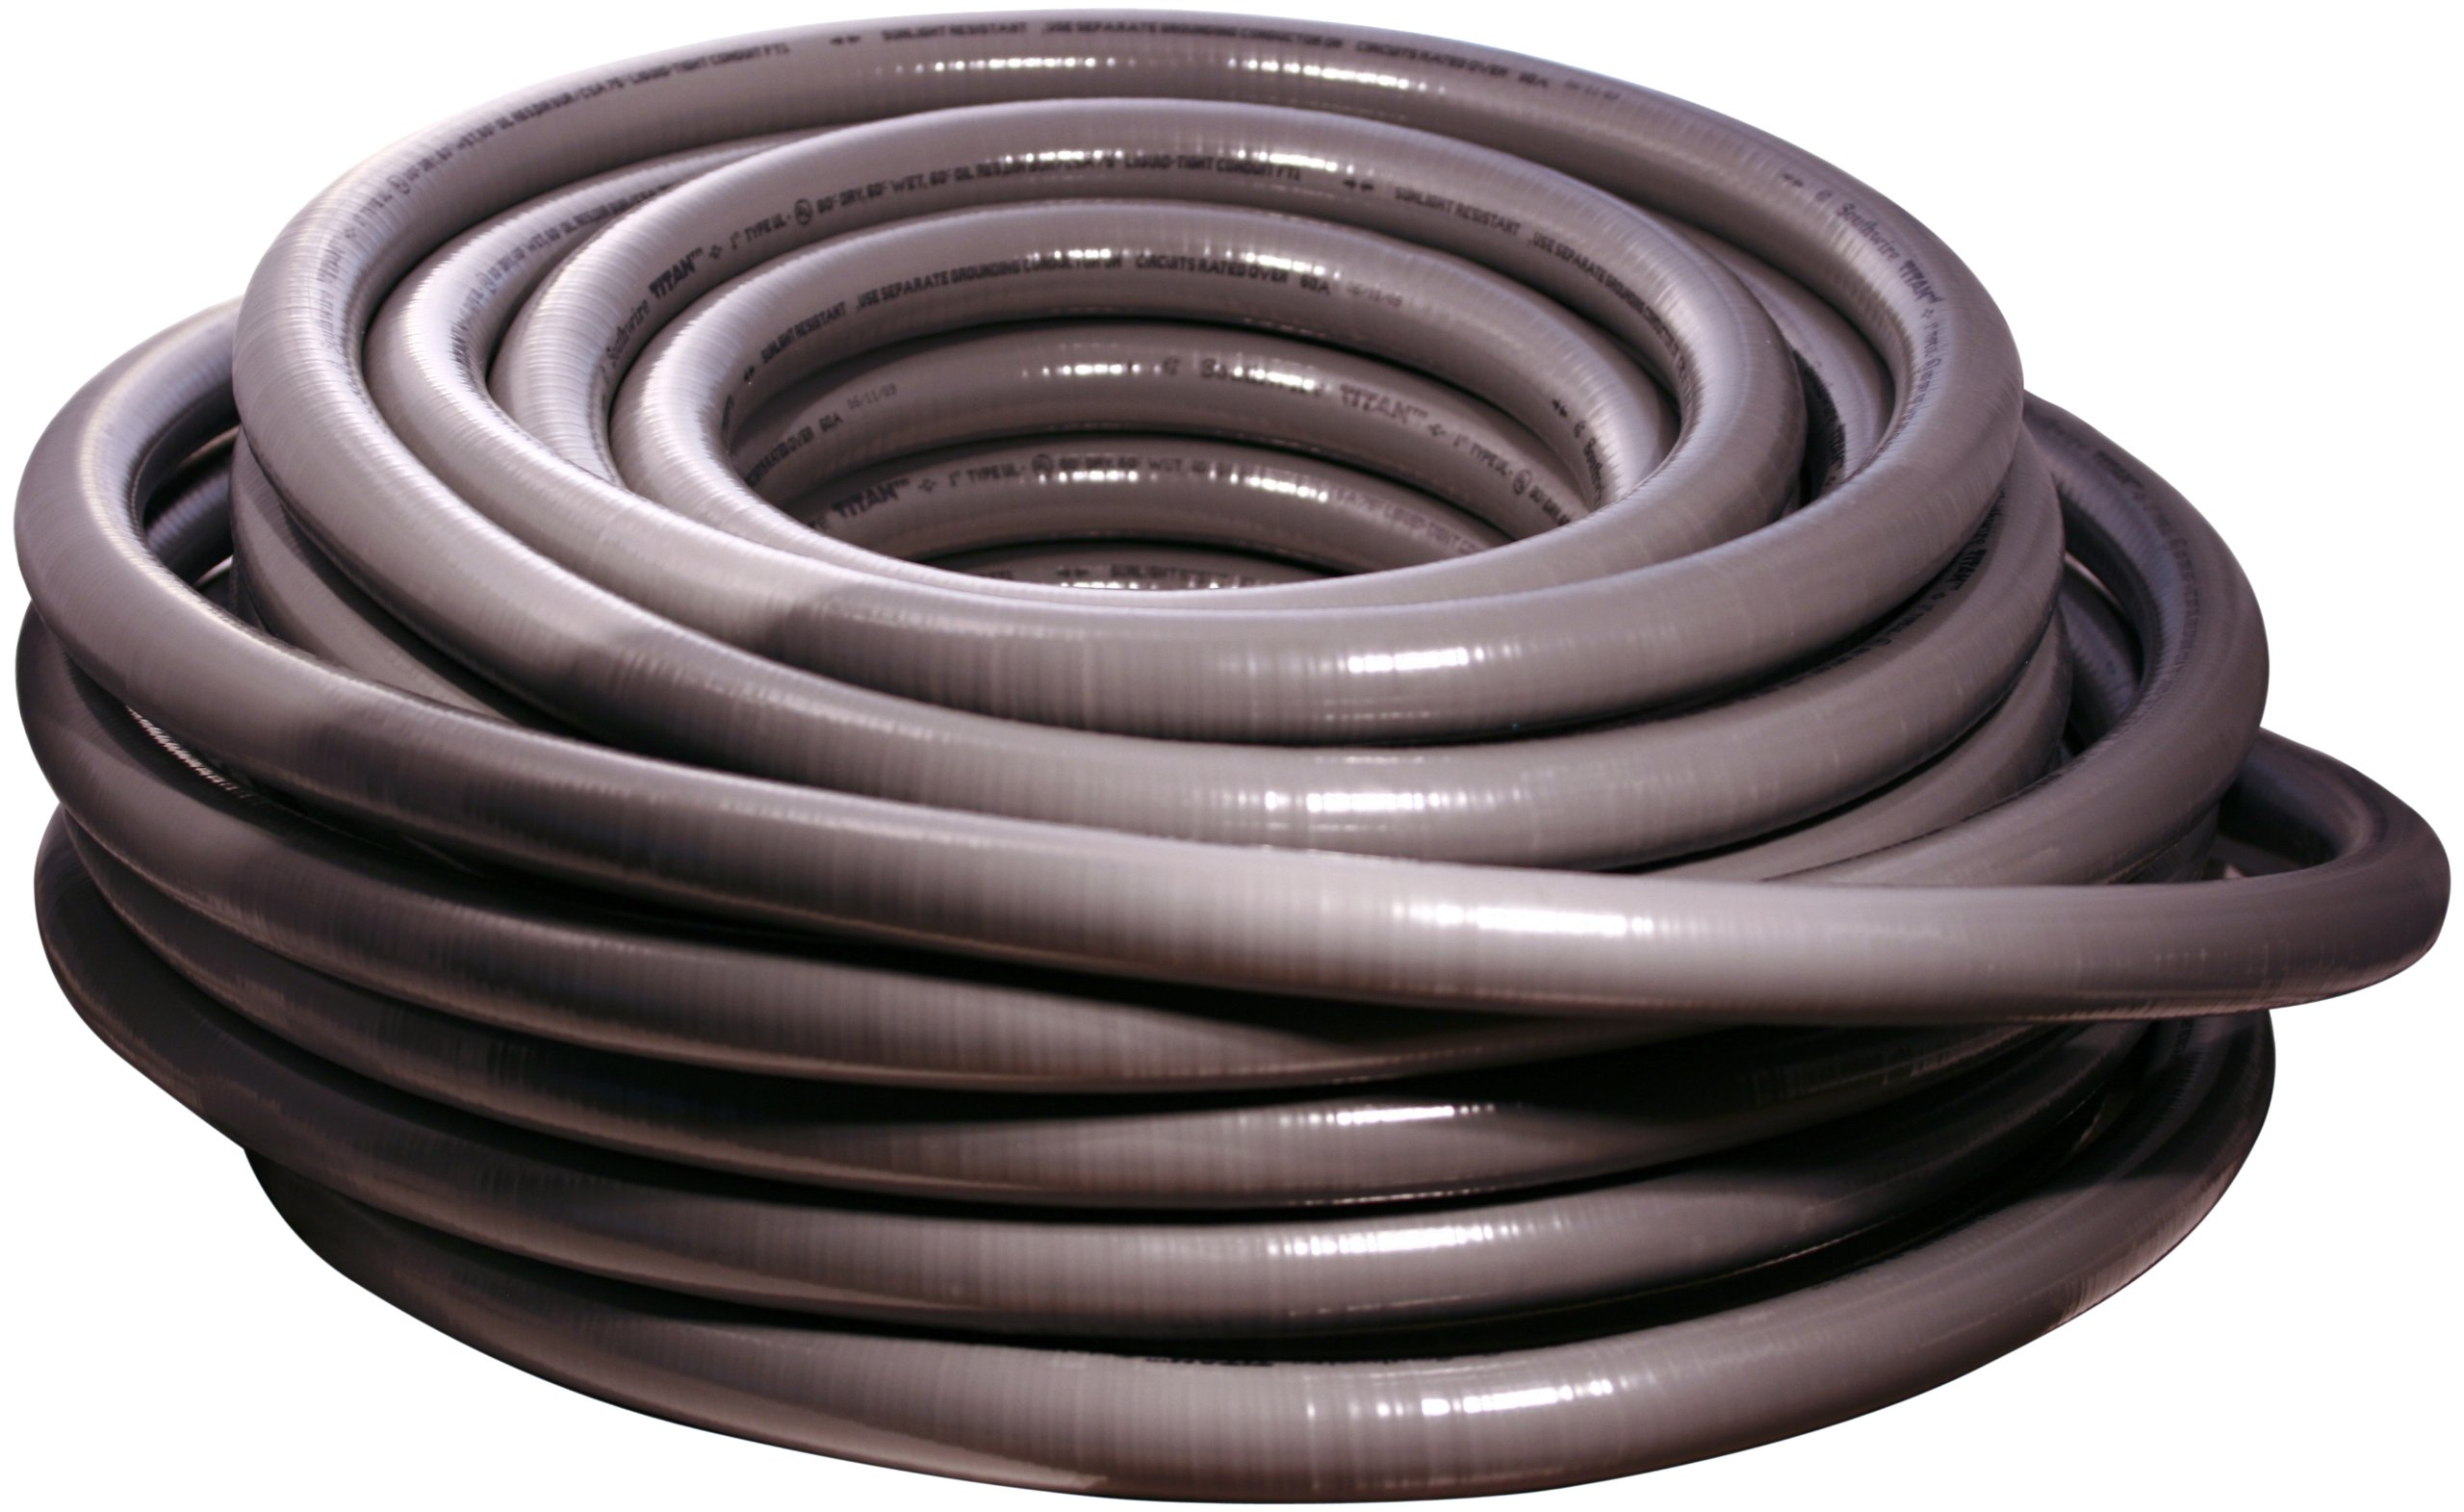 Southwire 55094301 100-Feet Ultratite-Type NM 3/4-Inch Non-Metallic Liquid tight Flexible Conduit